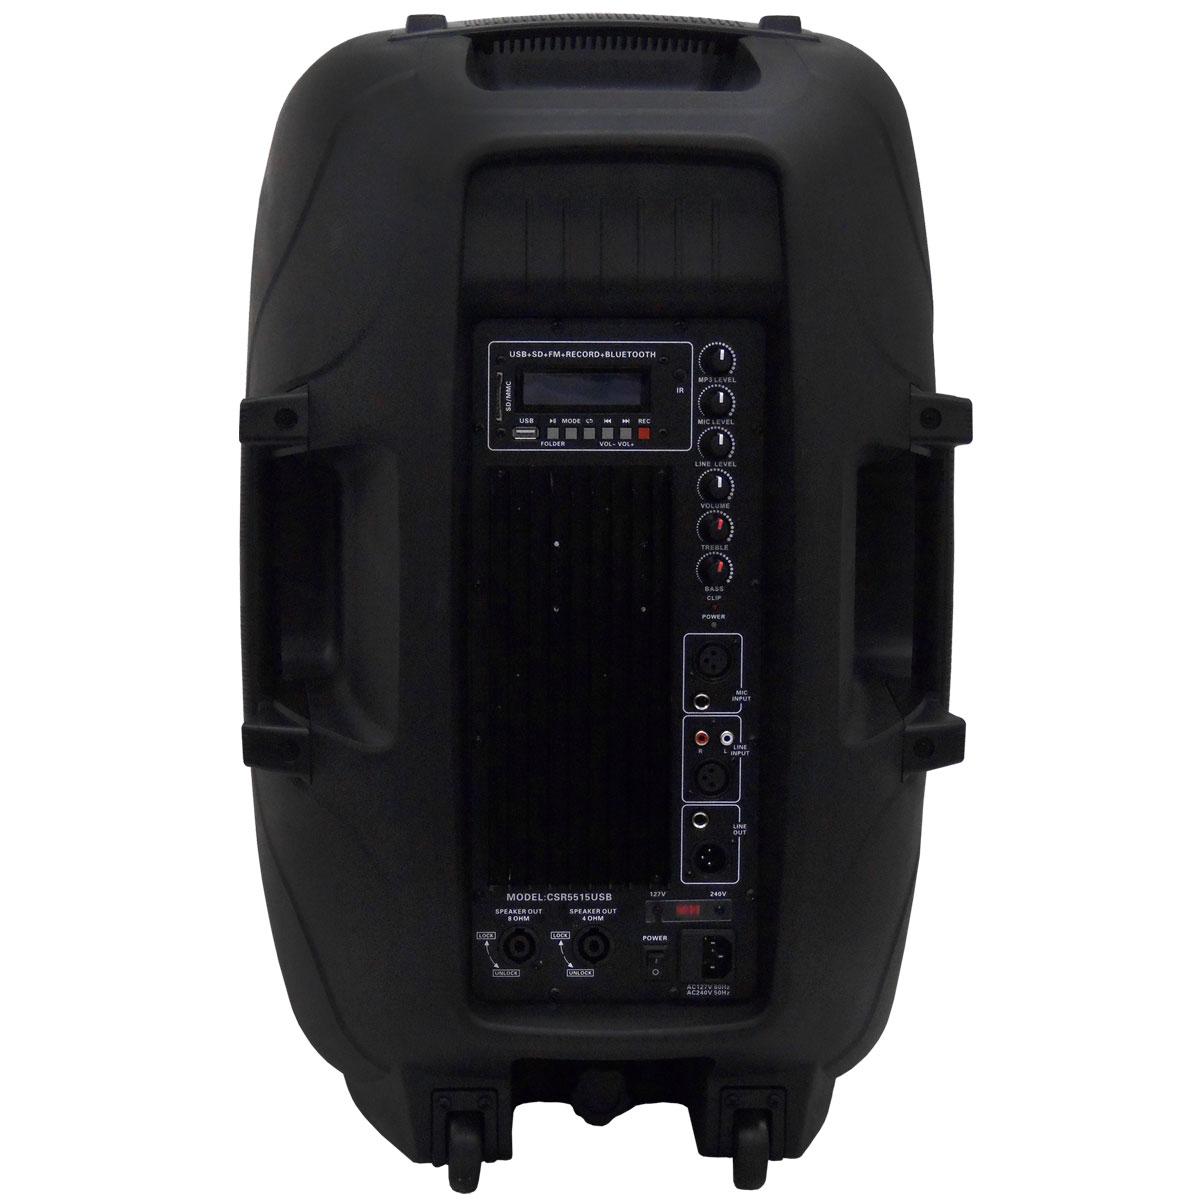 Caixa Ativa Fal 15 Pol 300W c/ USB / Bluetooth - CSR 5515 USB BT